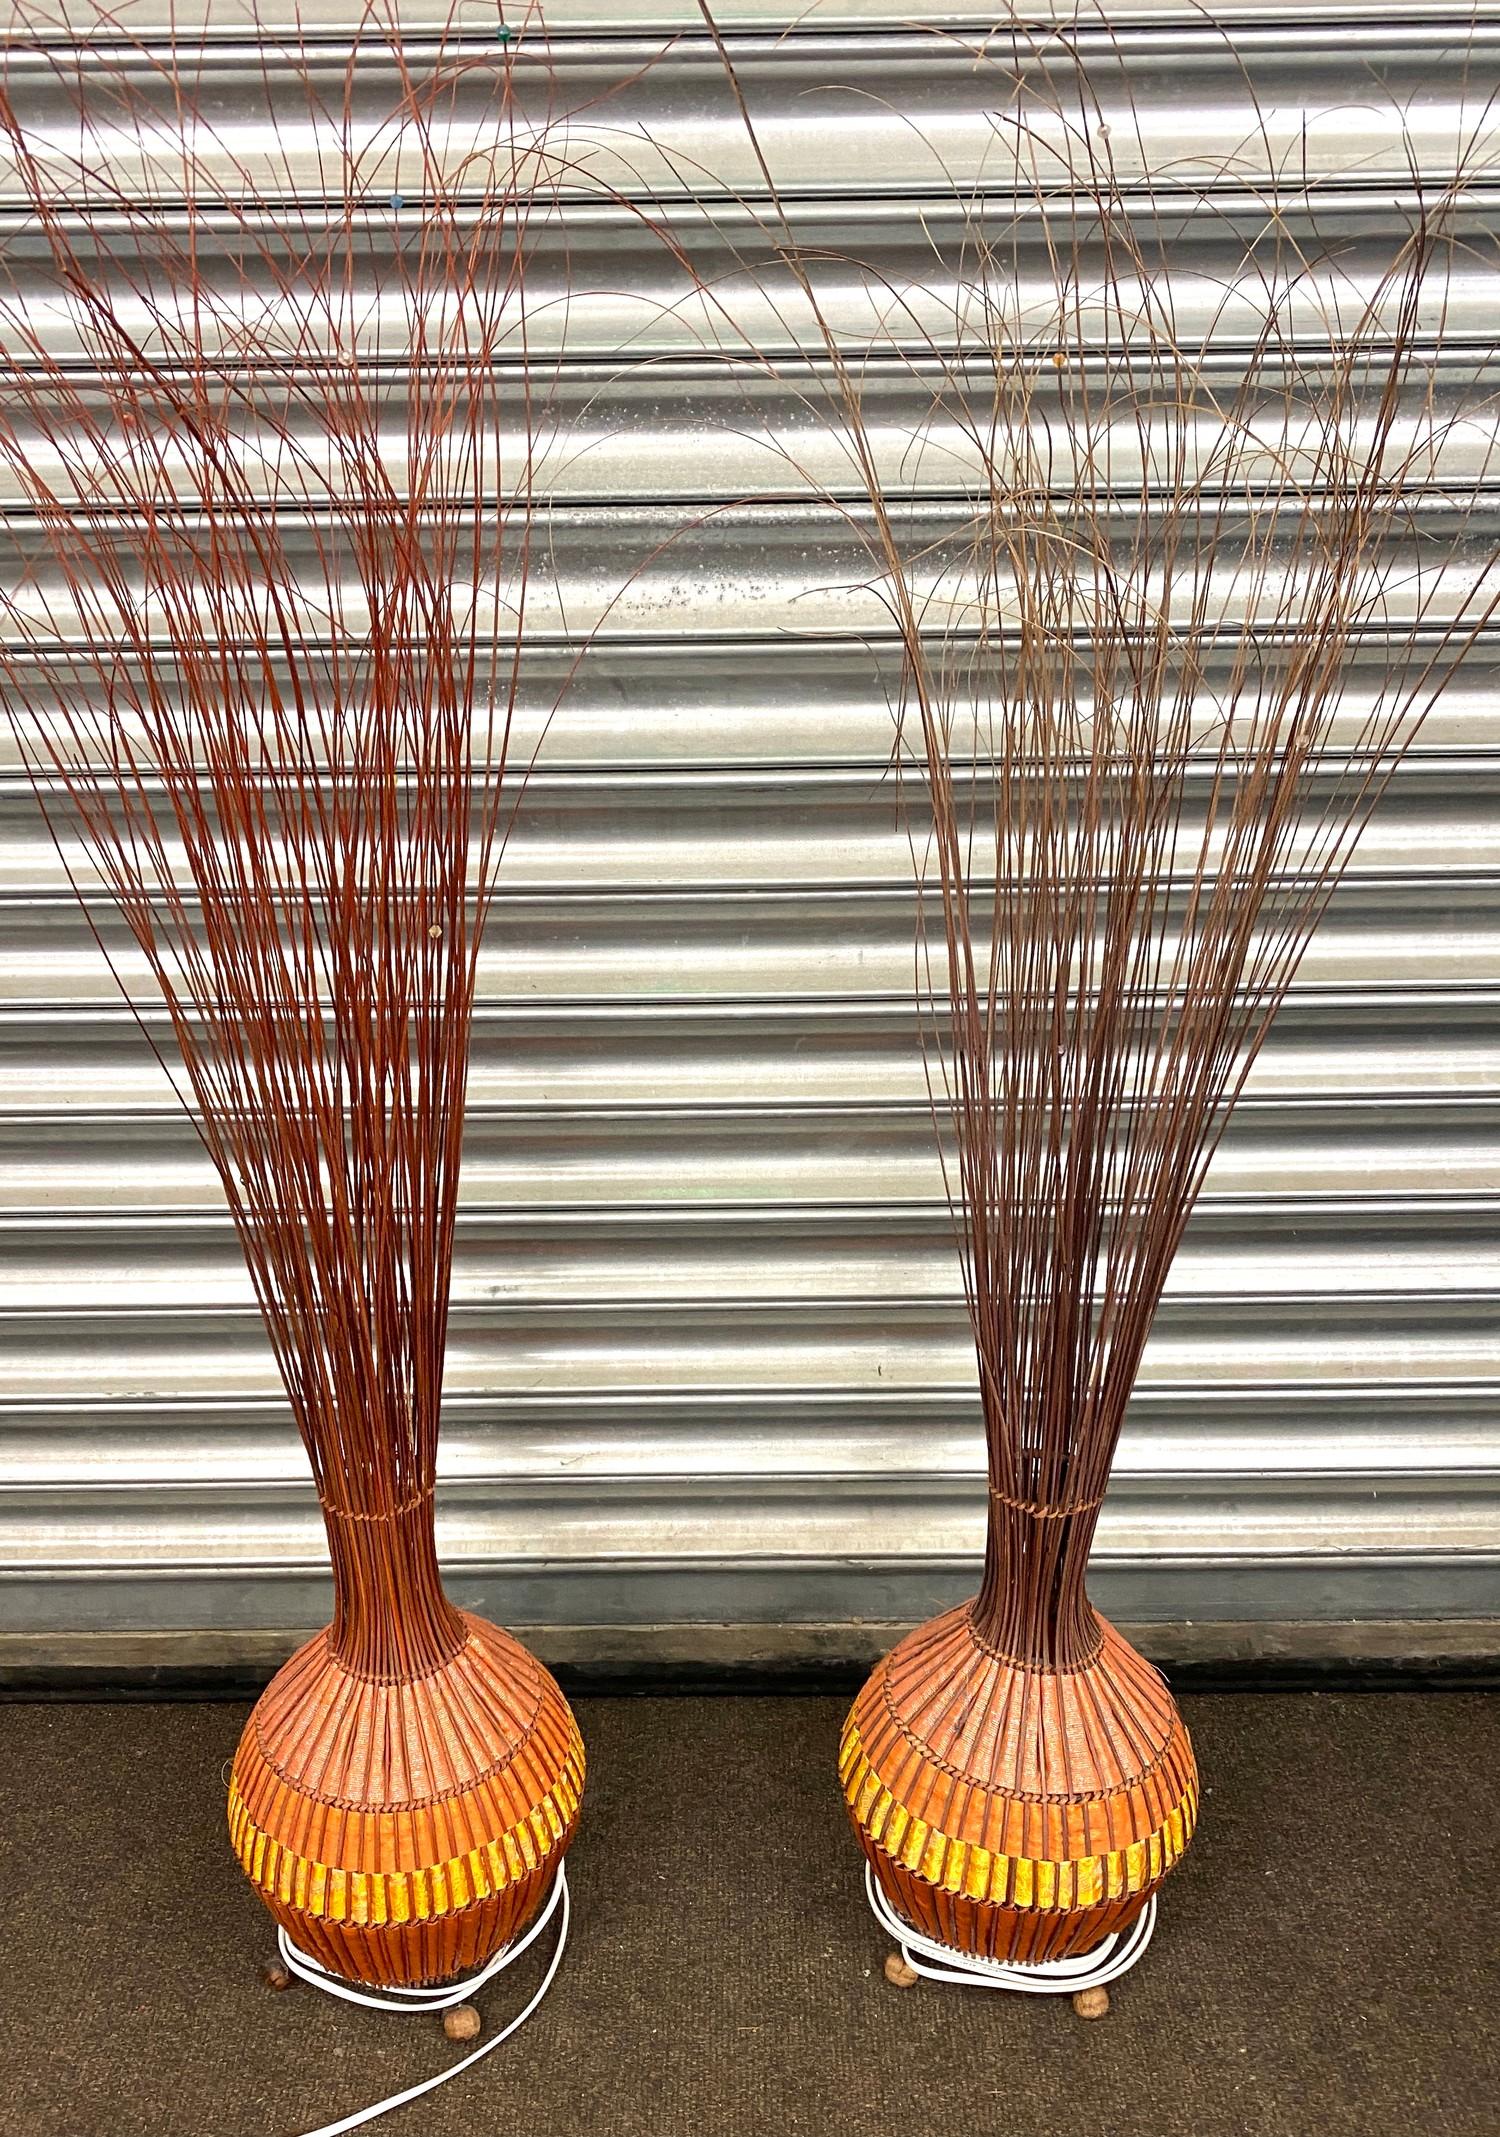 2 Orange onion lights, untested